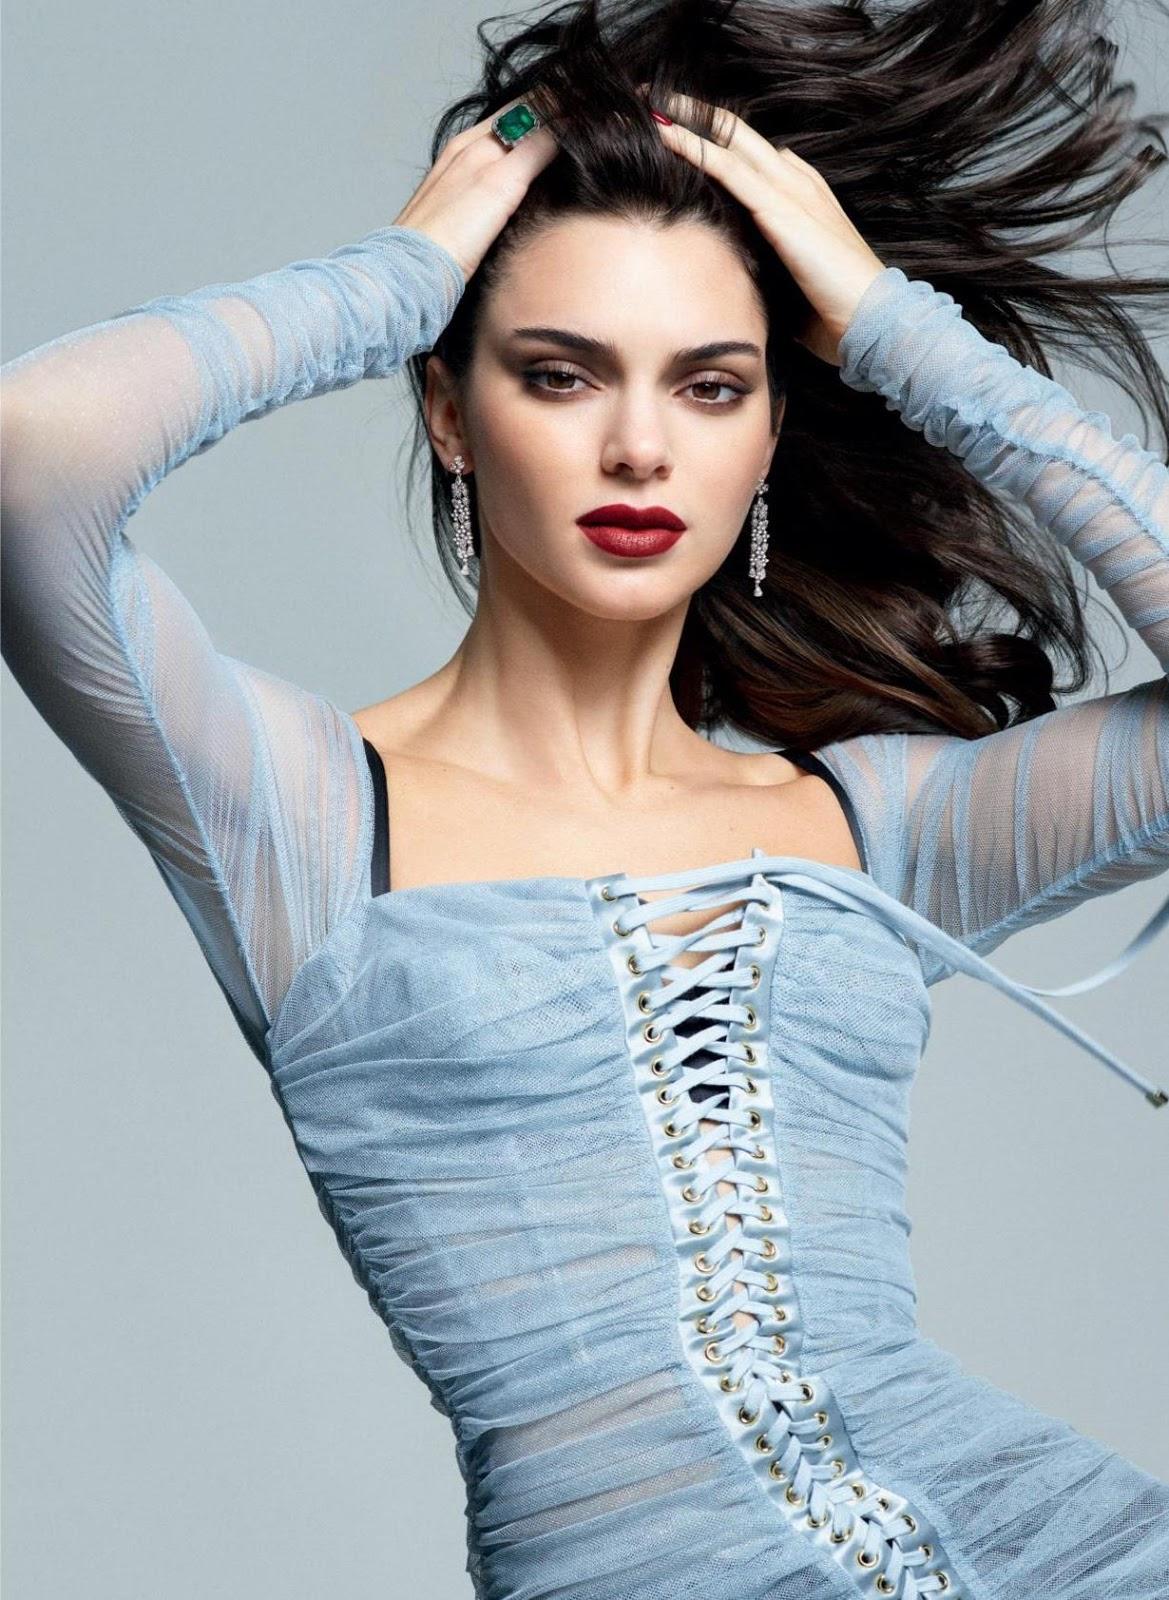 Kendall-Jenner-Luigi+Iango-Vogue-Russia (1).jpg